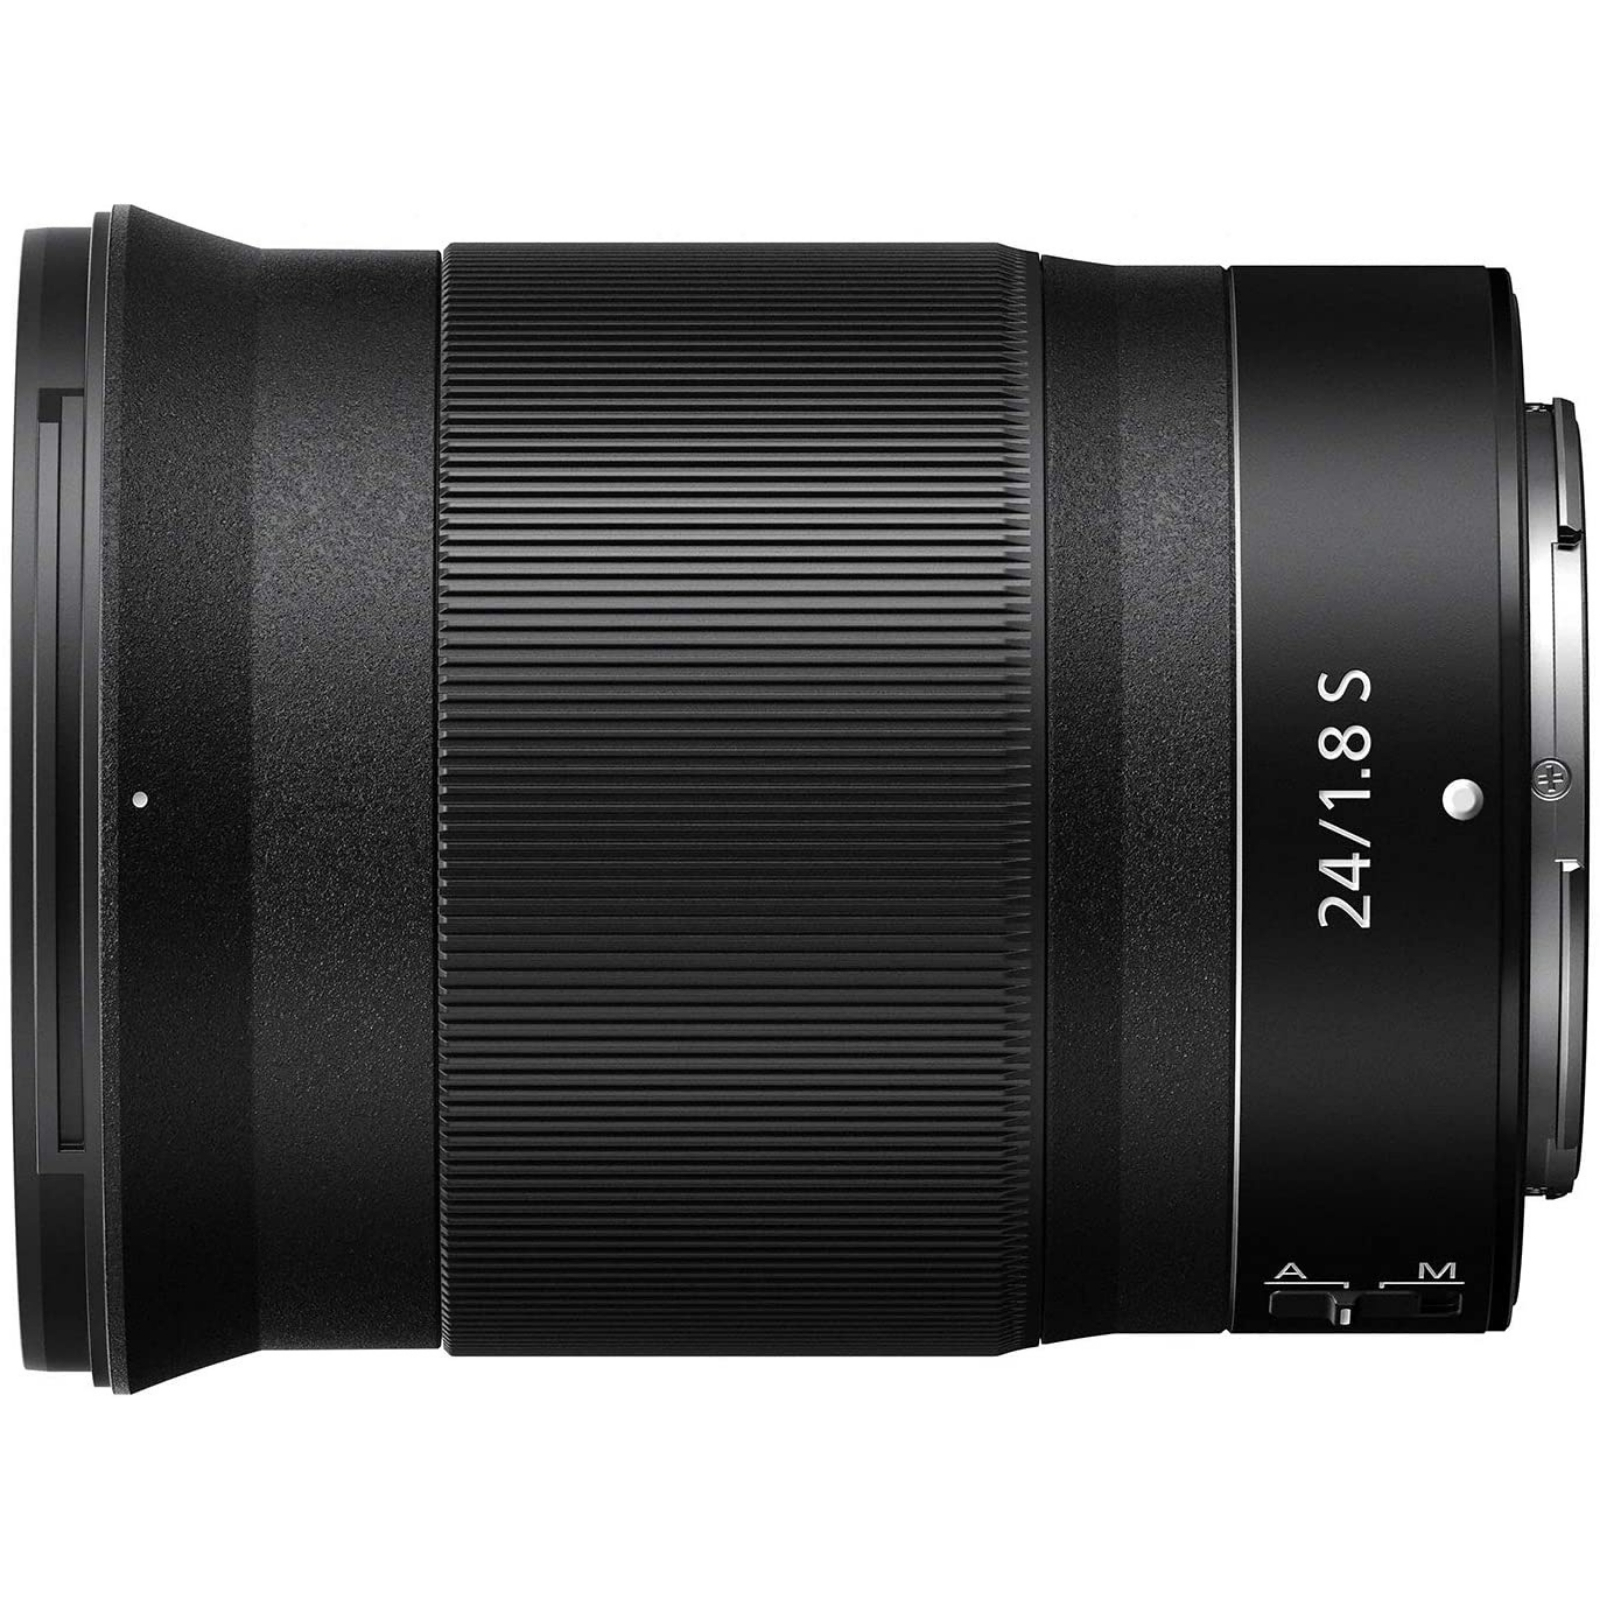 Nikon ニコン 広角単焦点レンズ NIKKOR Z 24mm f/1.8S ブラック 新品 (並行輸入品、保証付き)